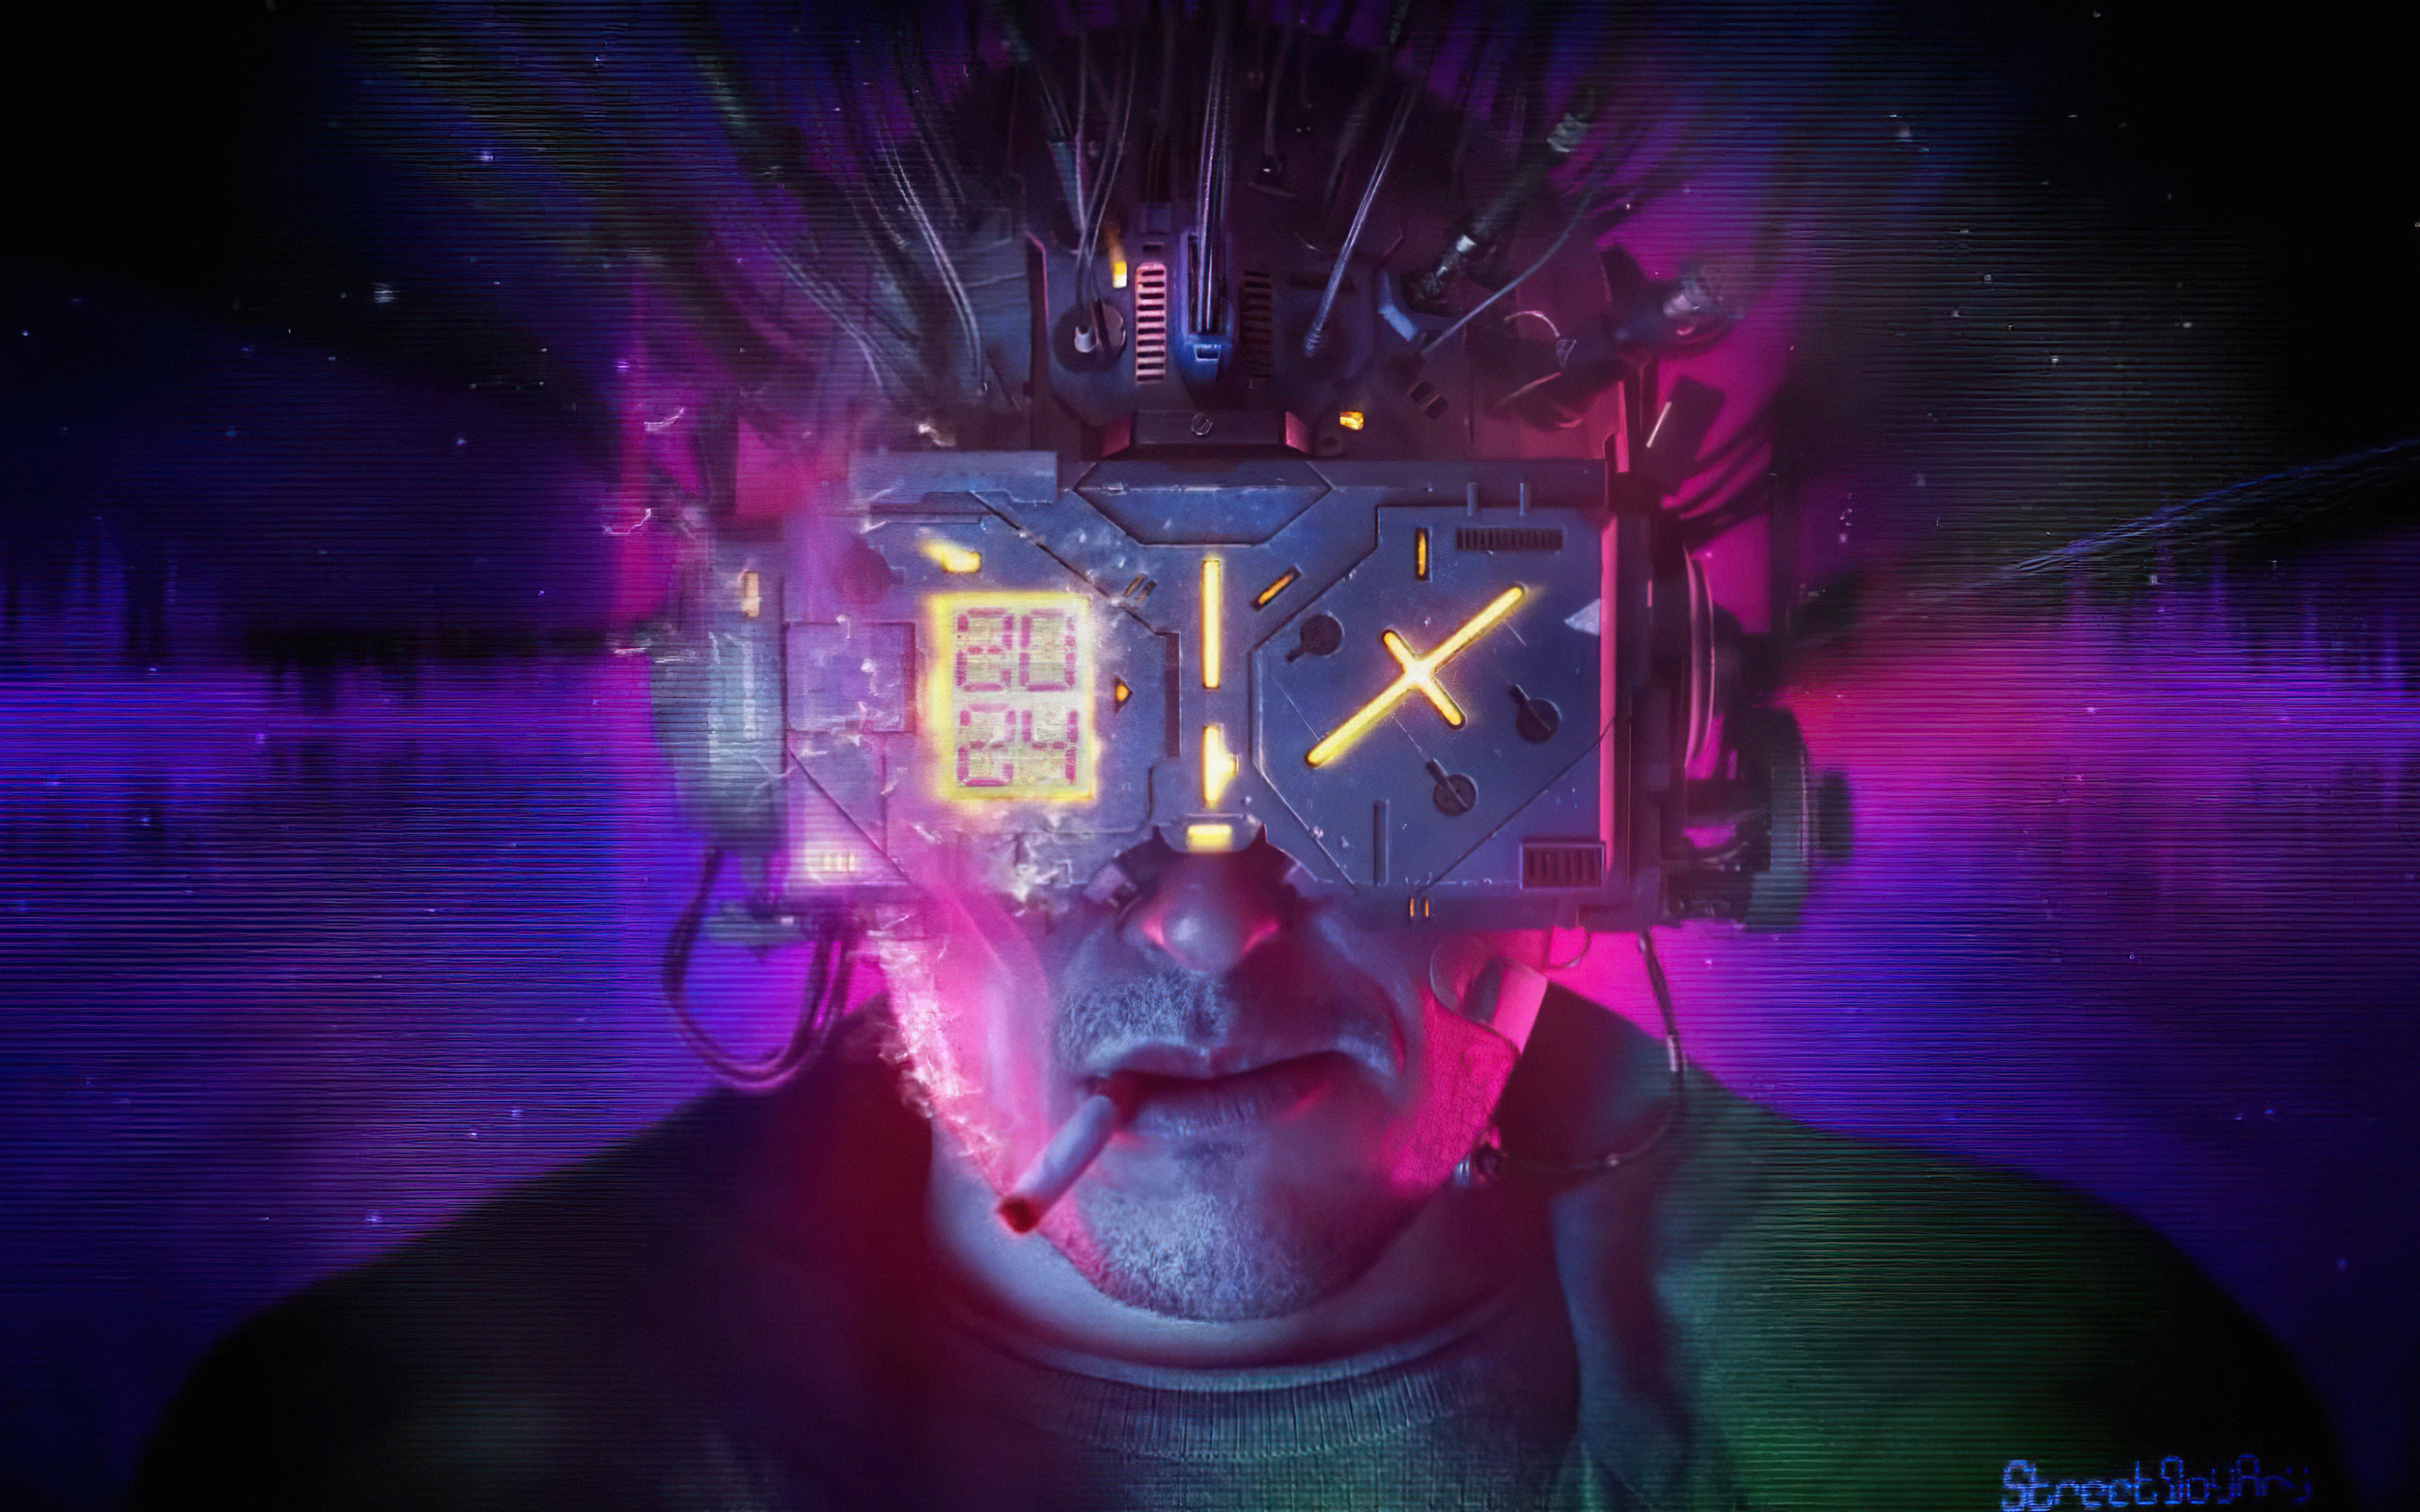 cyber-boy-no-limits-4k-4r.jpg